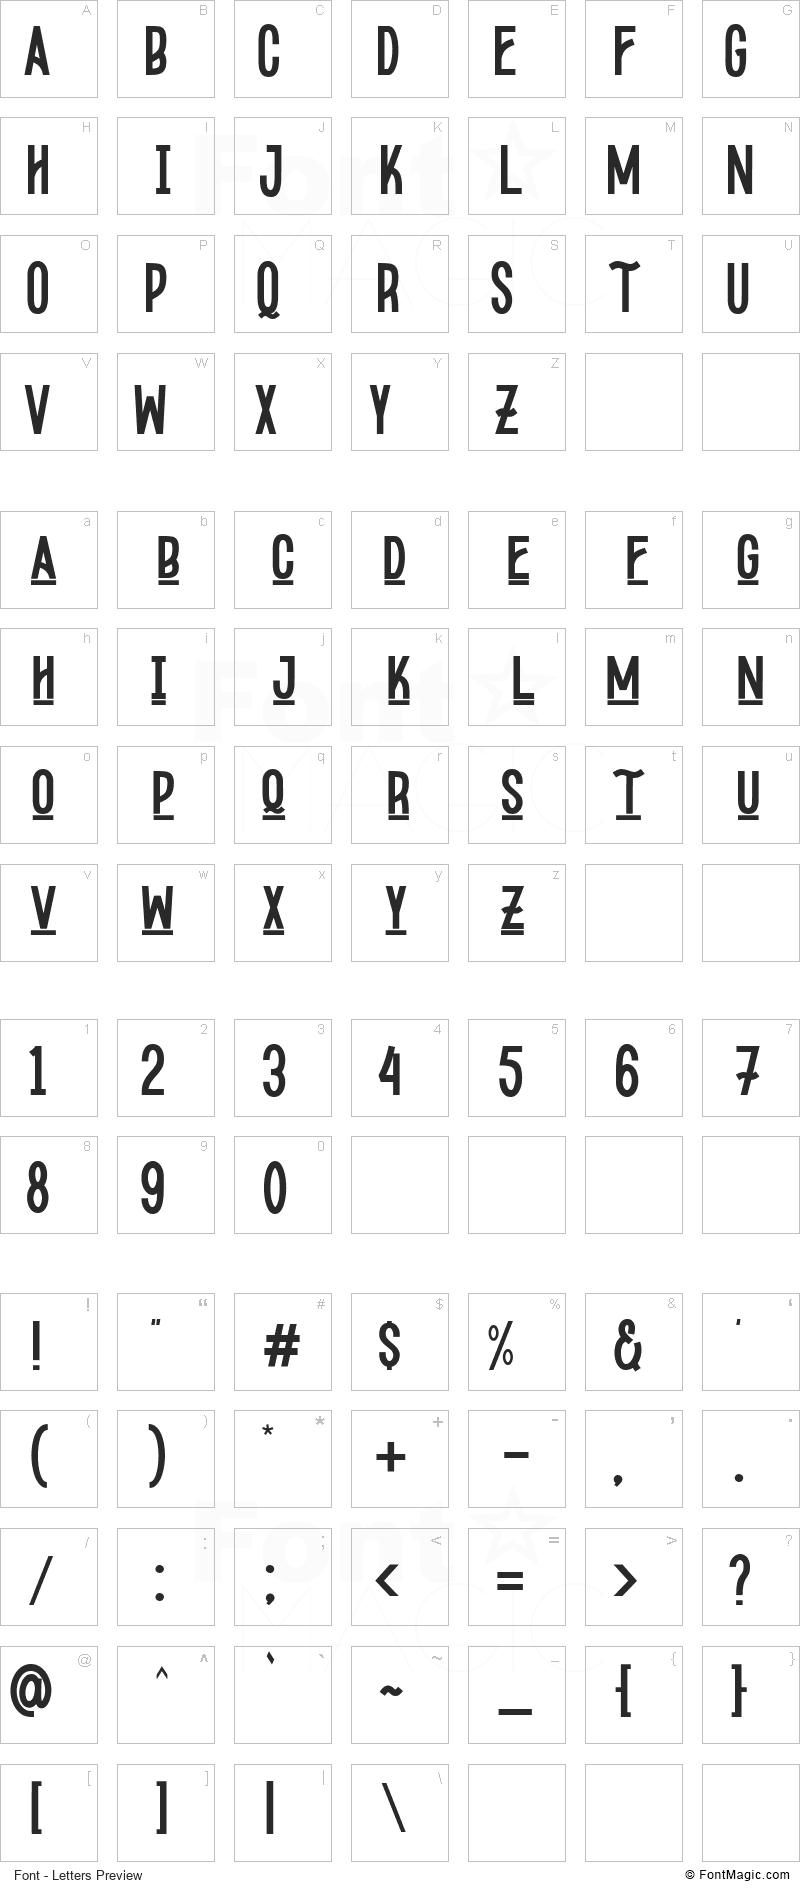 Kopodaps Font - All Latters Preview Chart